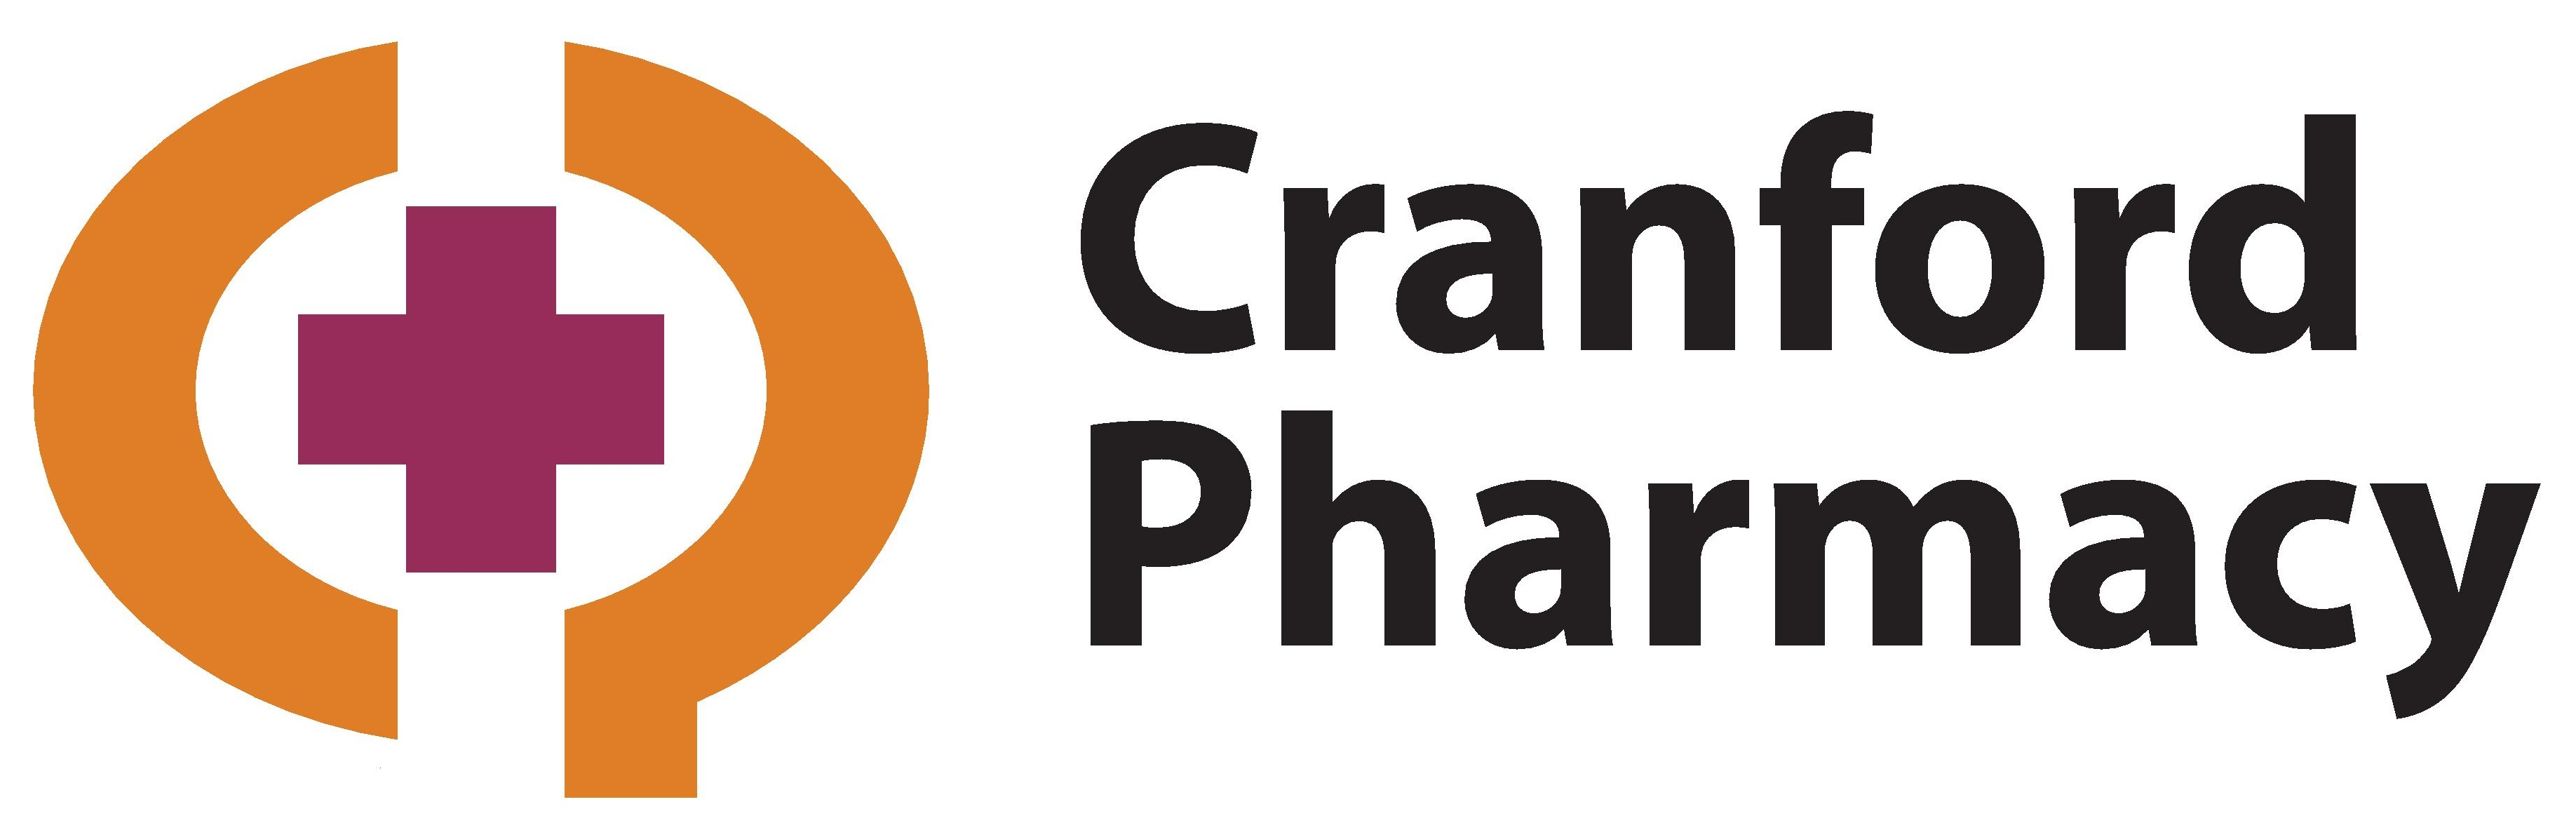 Logo - Cranford Pharmacy jpg